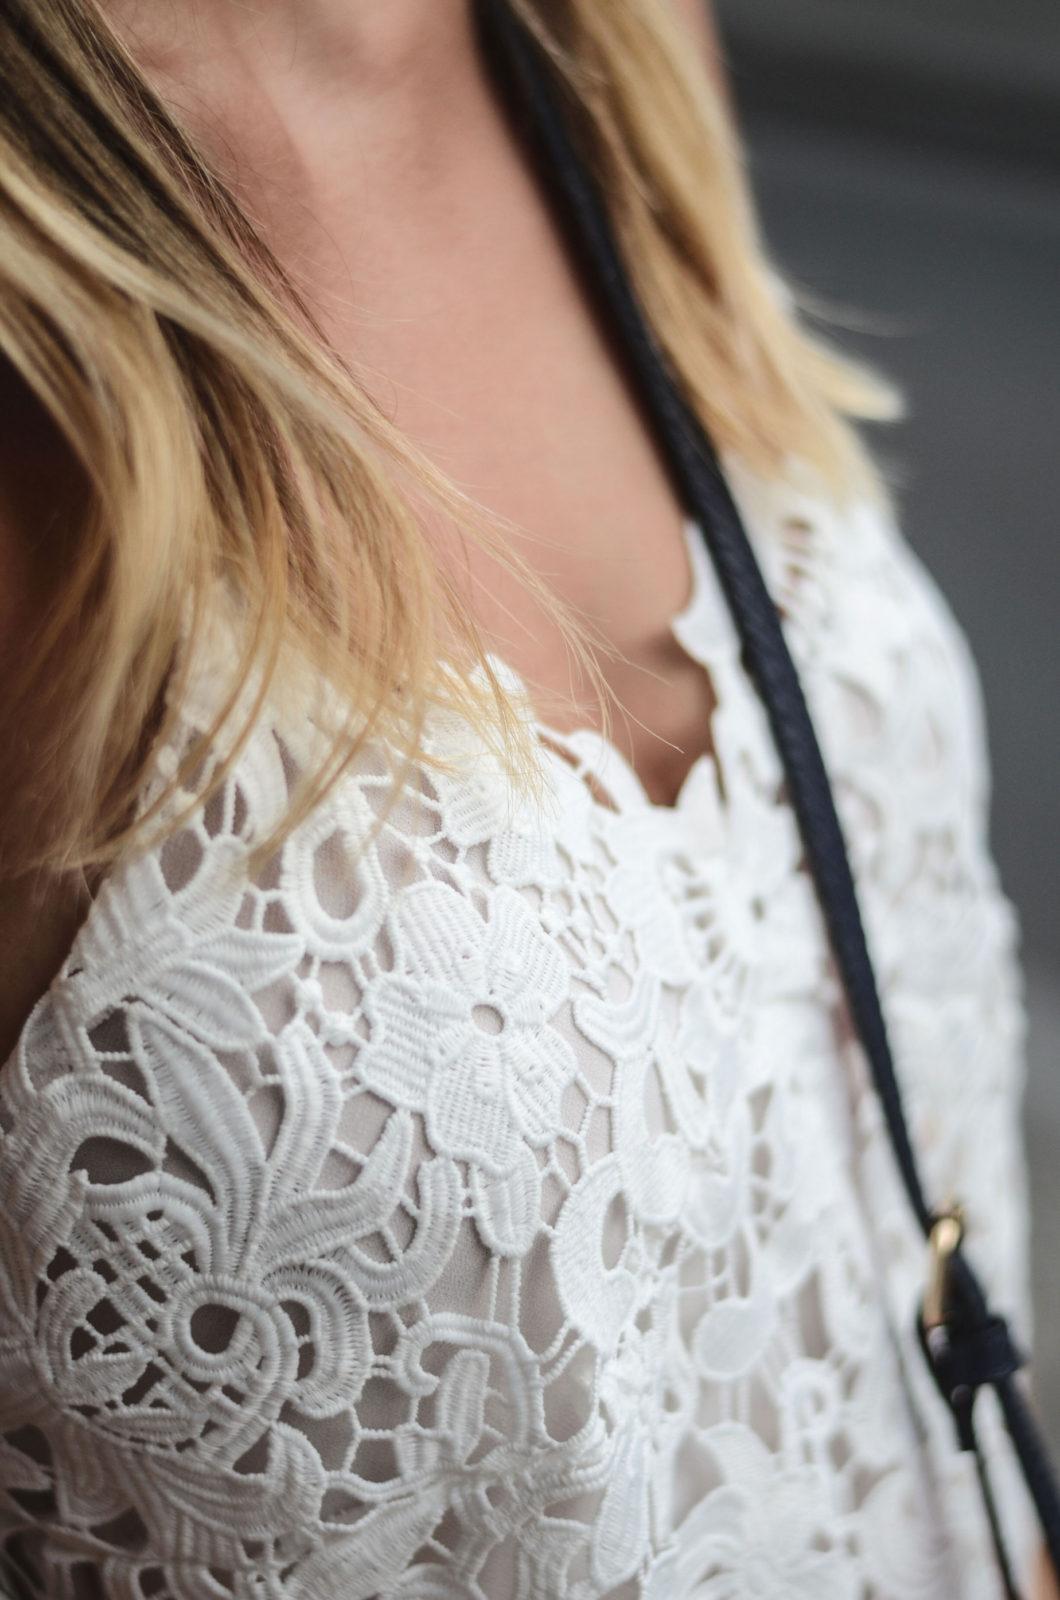 Sariety-modeblog-heidelberg-sarah-czok-fashionblogger-zara-spitzenkleid-superga-aldo-bag-16